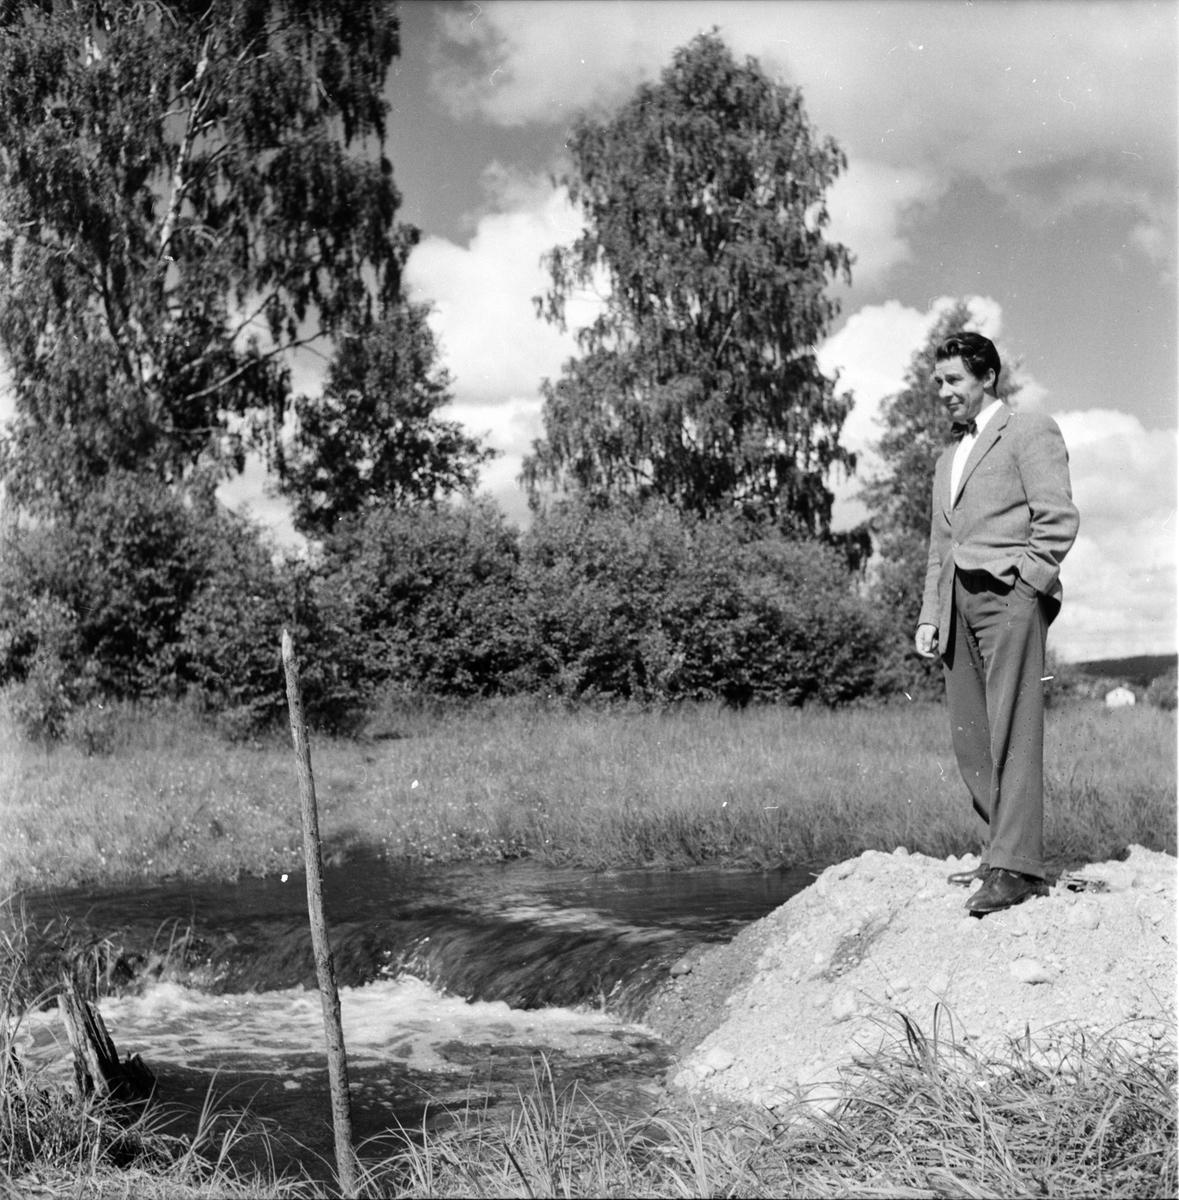 Vågen, Dammen, Stadsing St Sandström Bild 12 Juli 1957